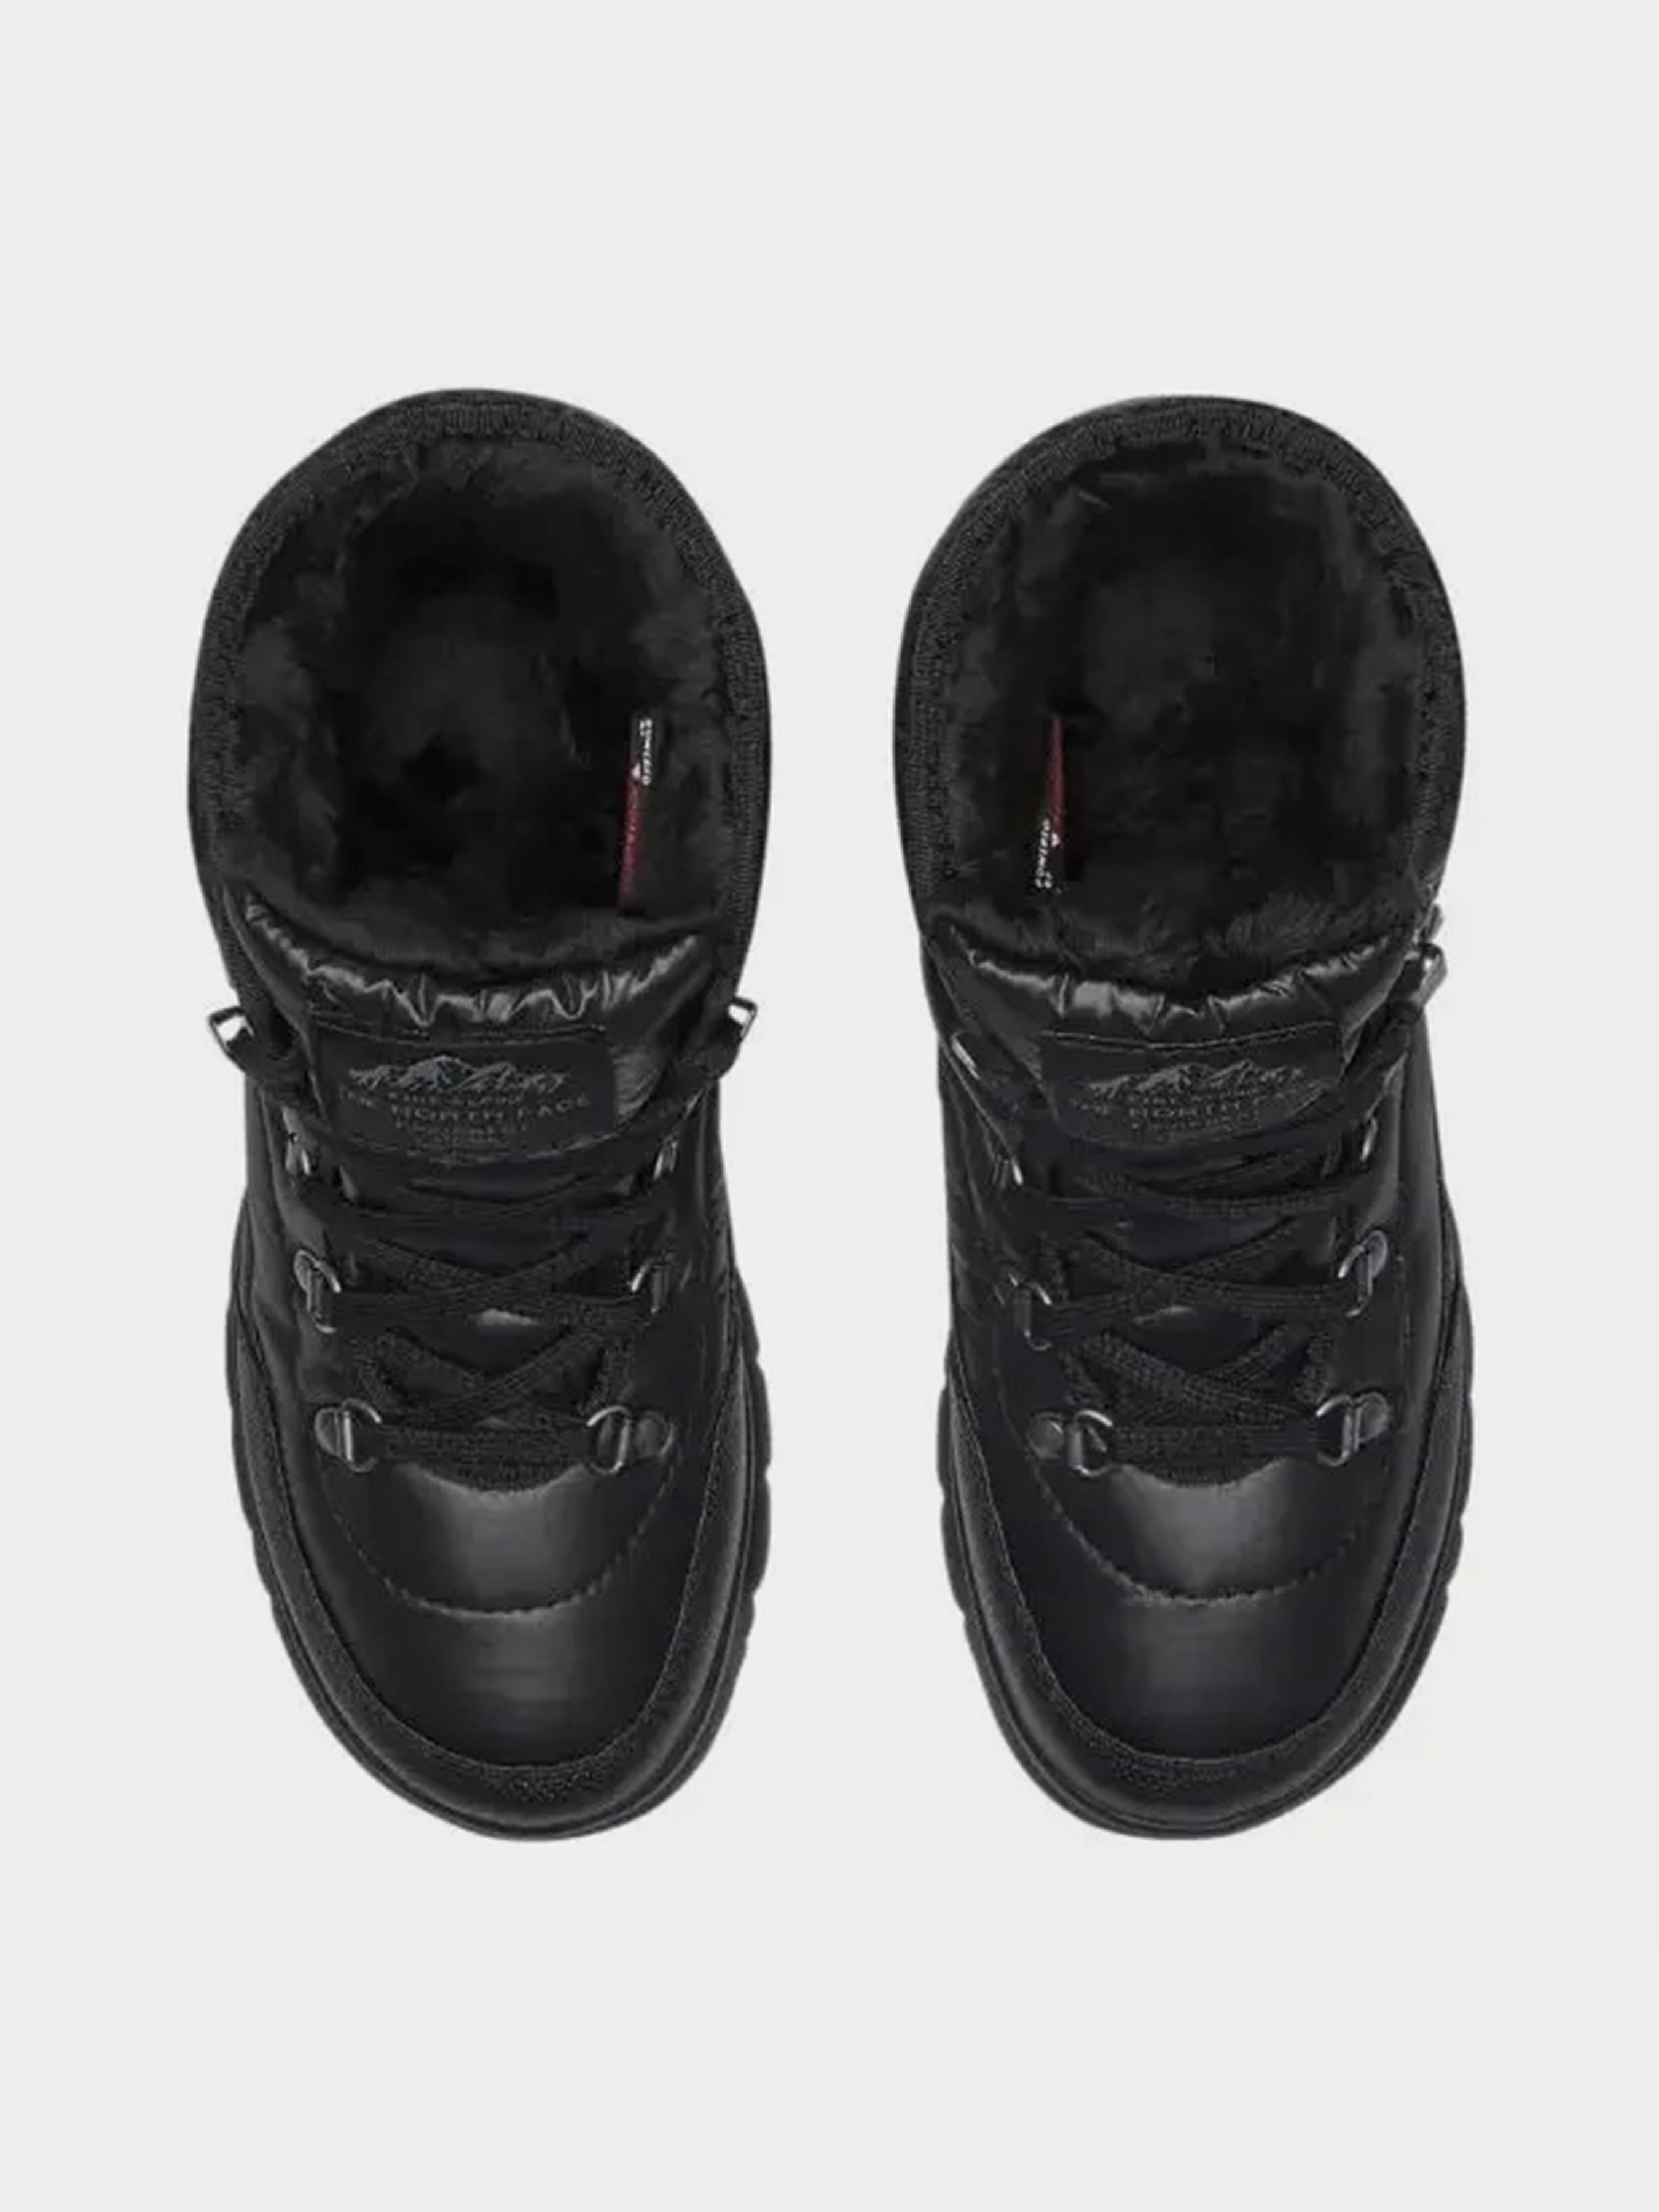 Ботинки для женщин The North Face ThermoBall™ Lace II NO9796 купить в Интертоп, 2017